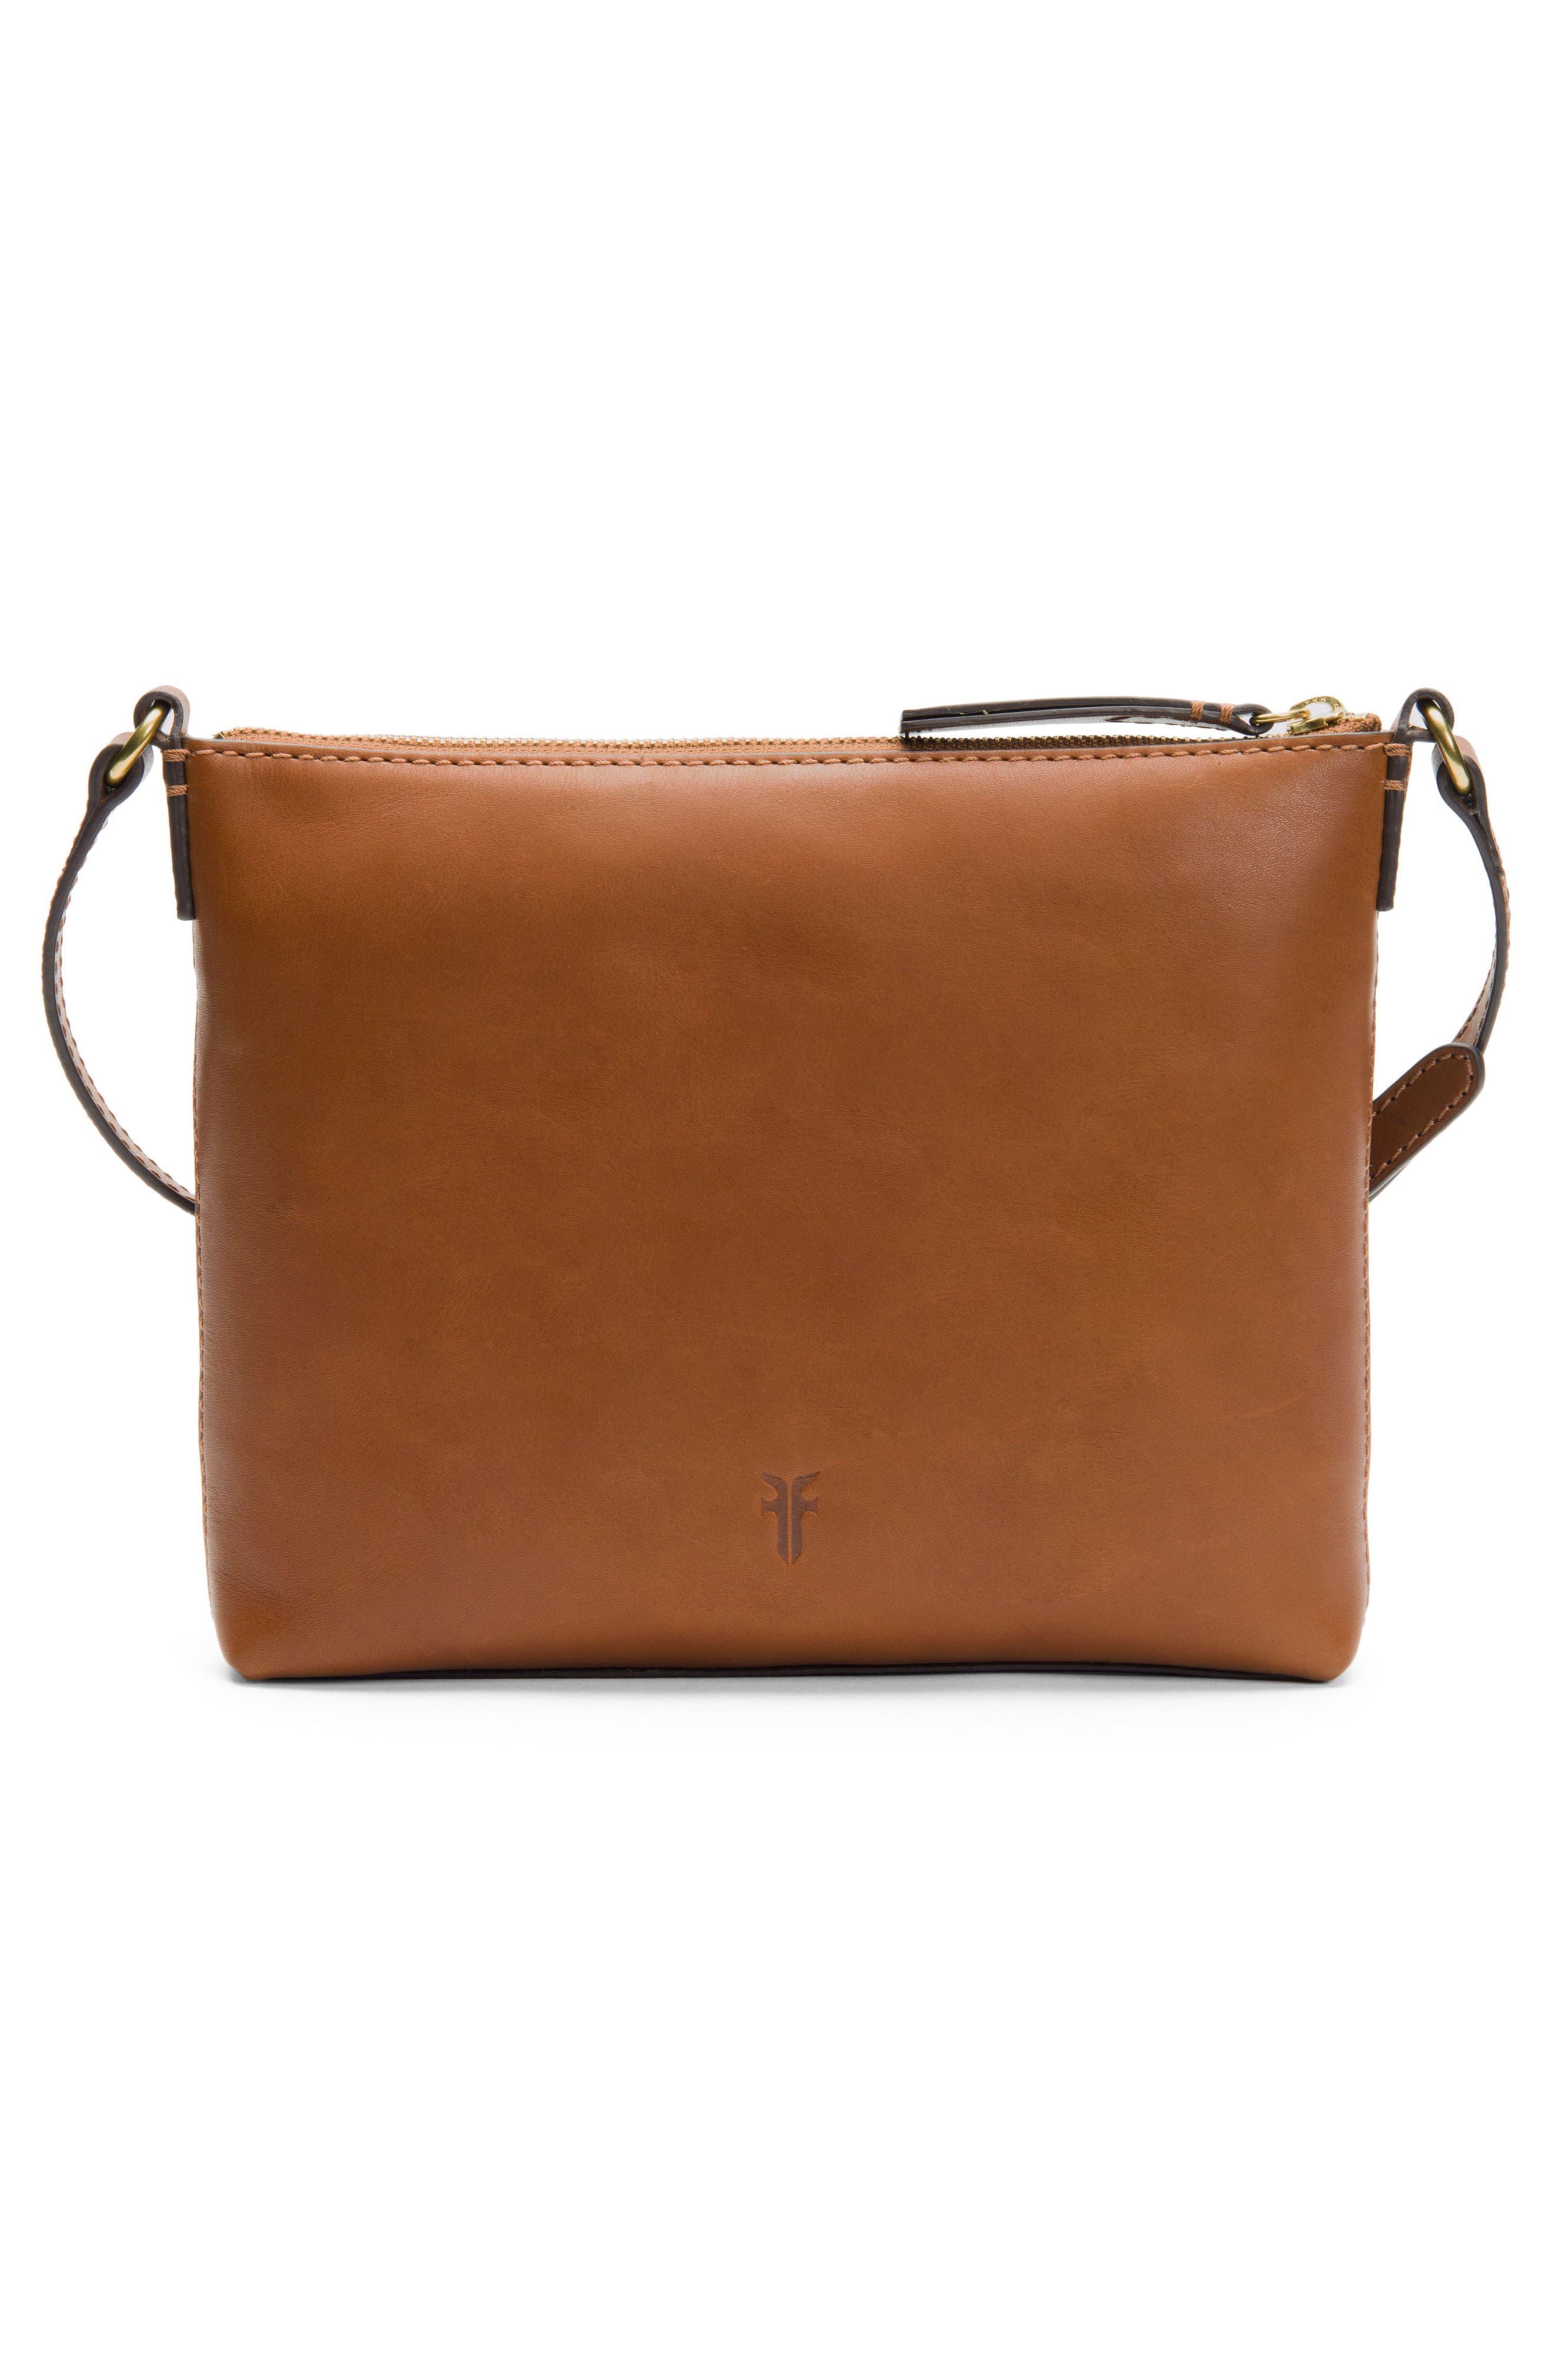 Carson Leather Crossbody Bag,                             Alternate thumbnail 3, color,                             COGNAC